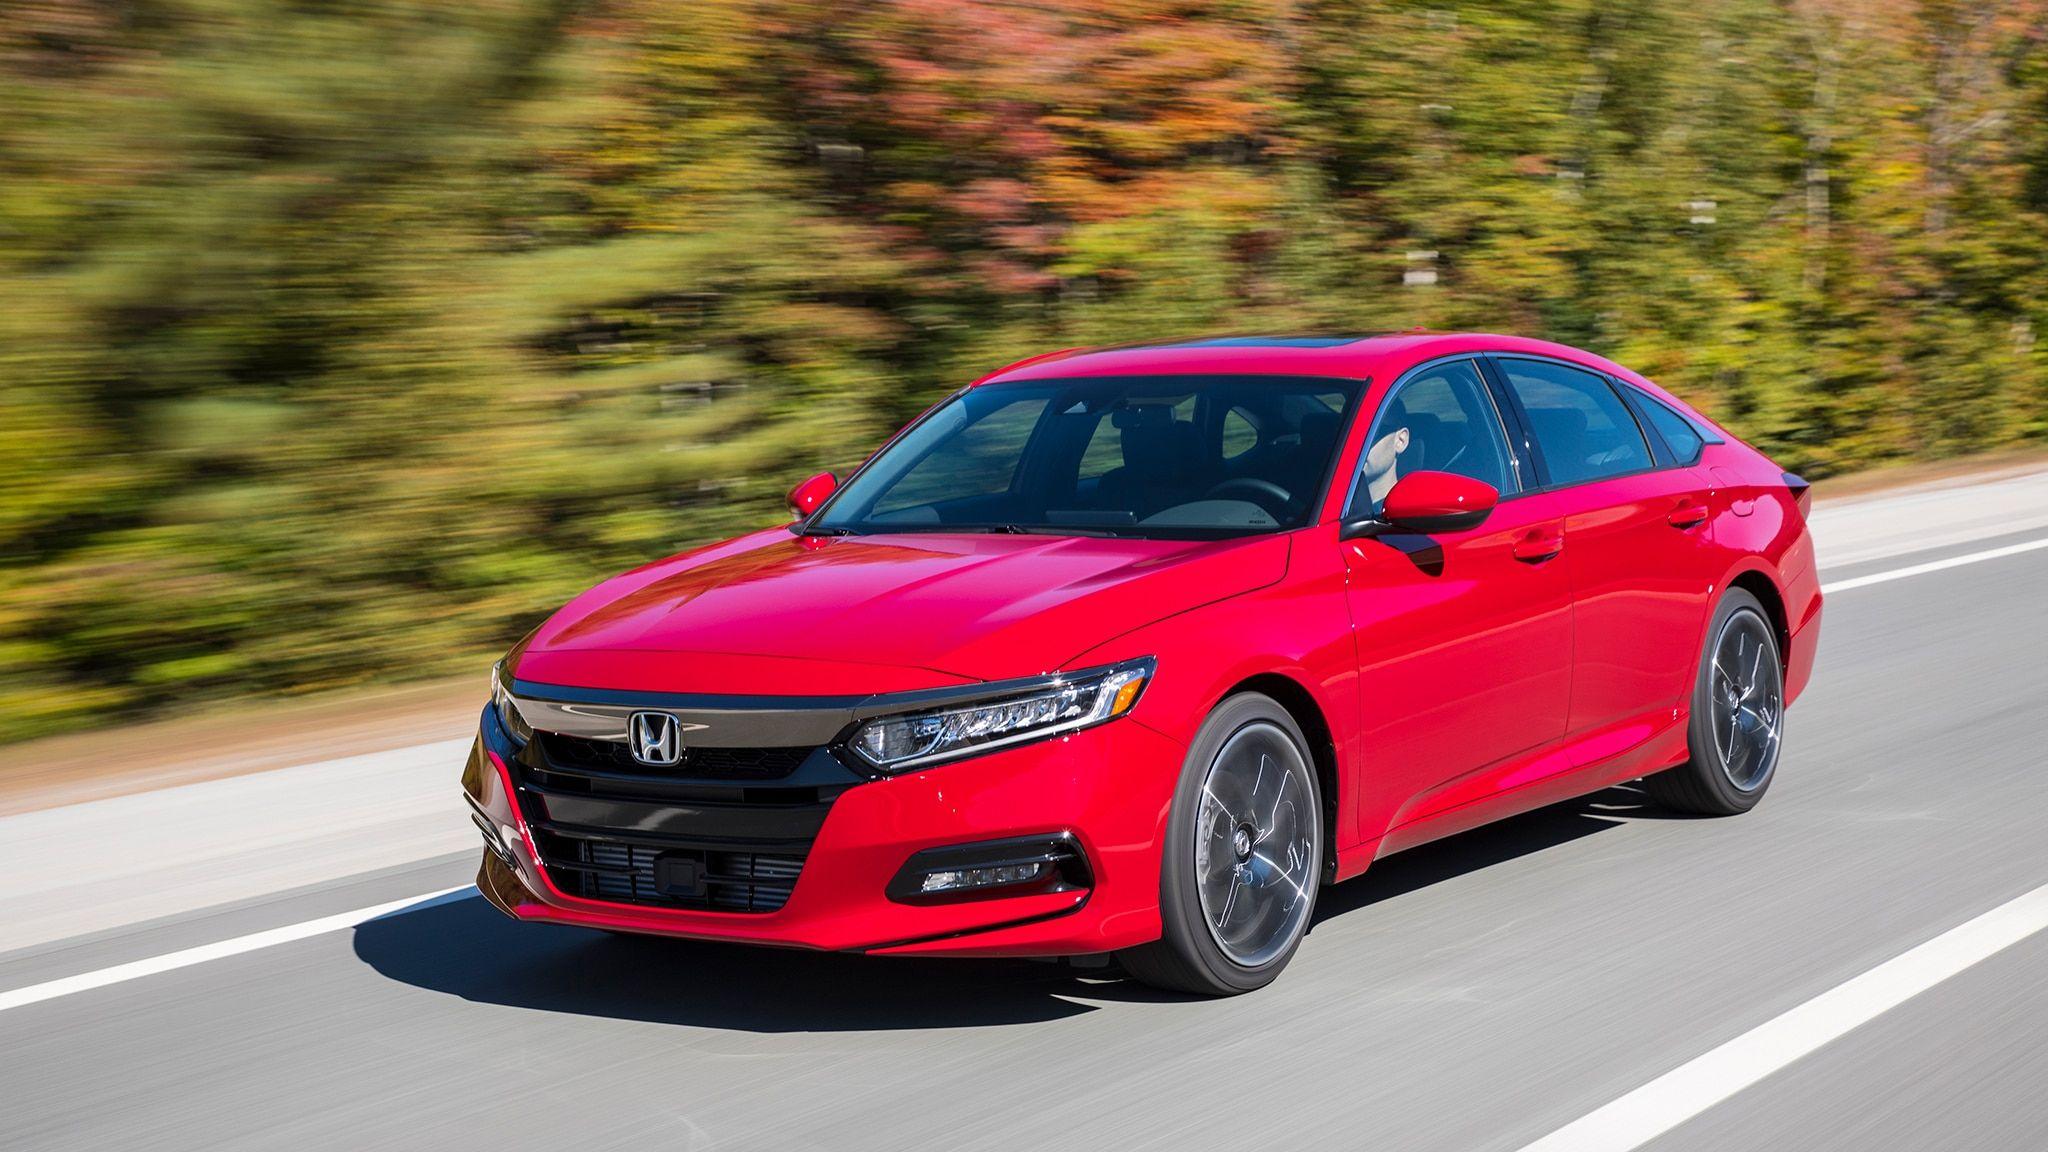 2020 Honda Accord Priced From 24 800 Honda Accord Touring Honda Accord Honda Accord Coupe